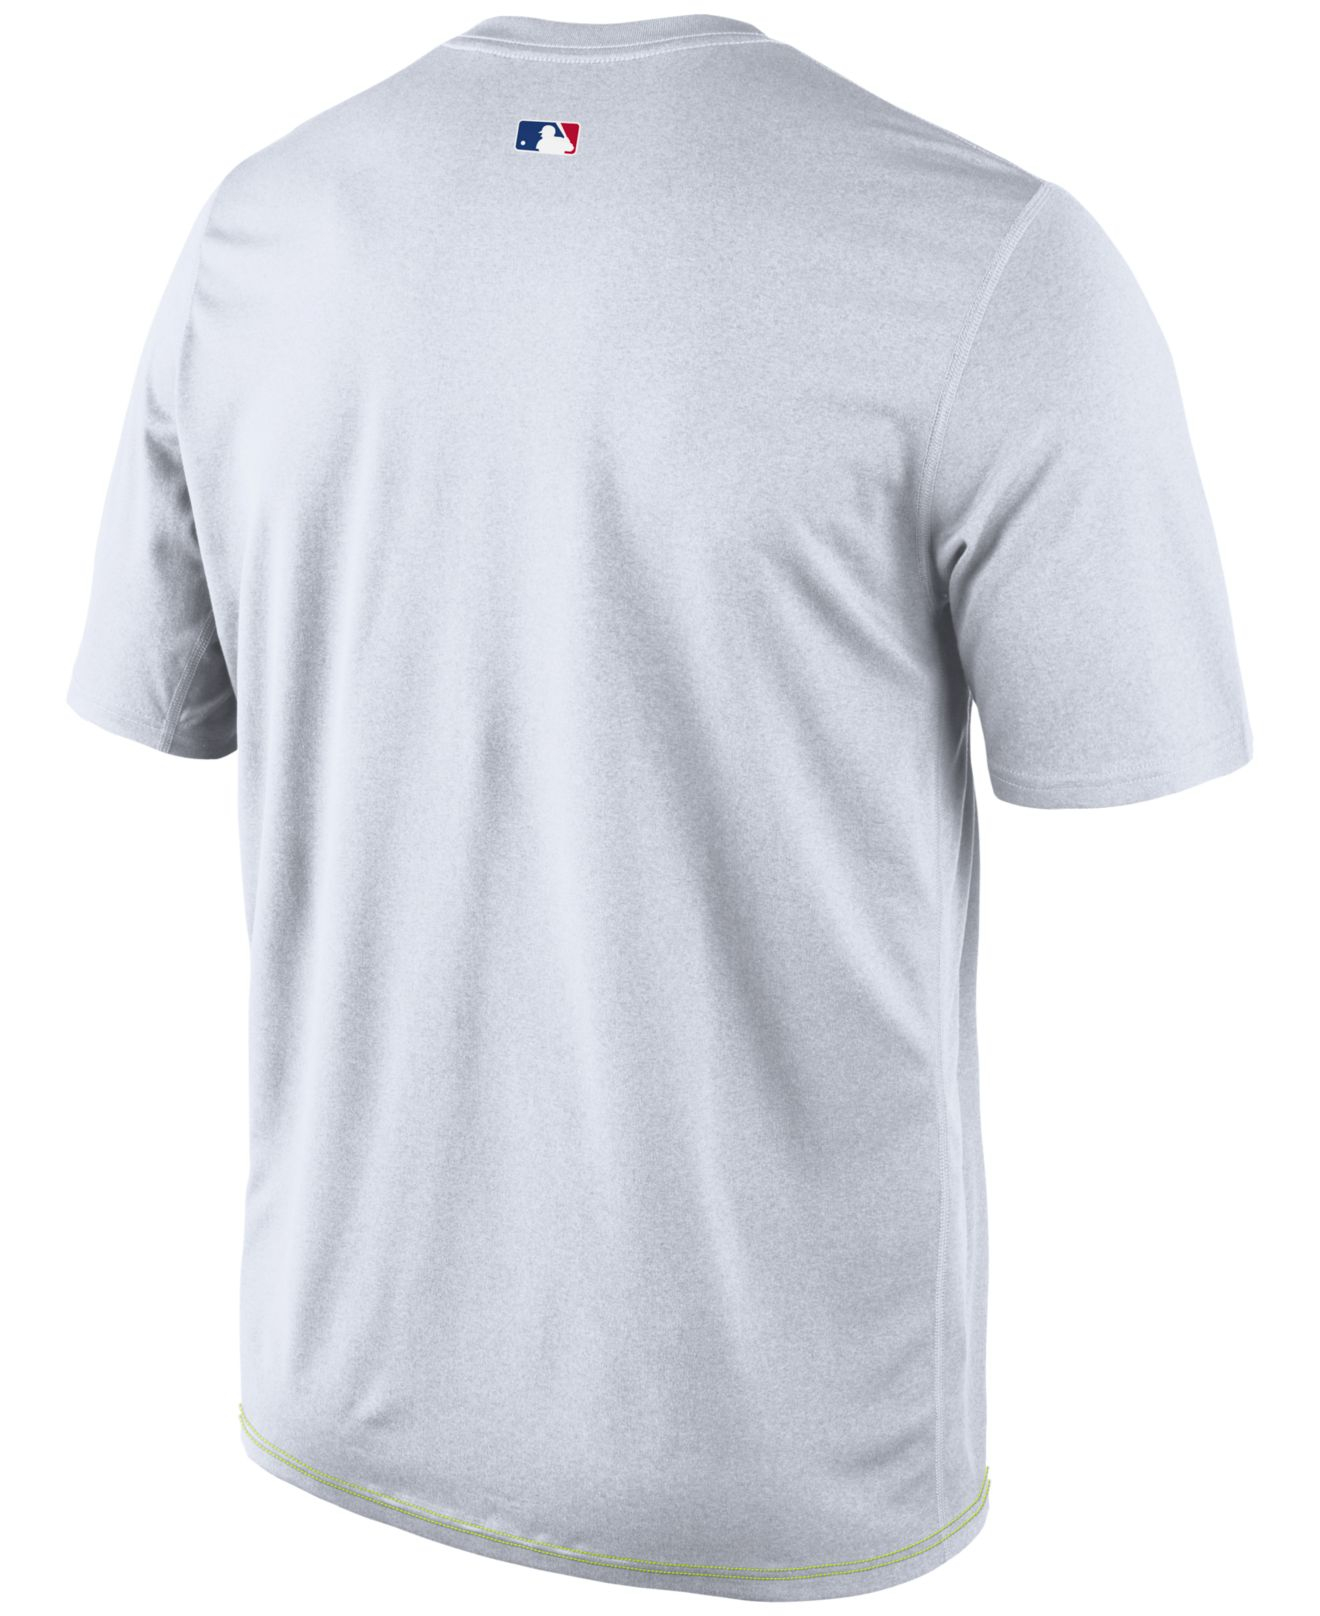 premium selection 07522 76832 Lyst - Nike Men S Chicago Cubs Dri-Fit Legend T-Shirt in White for Men